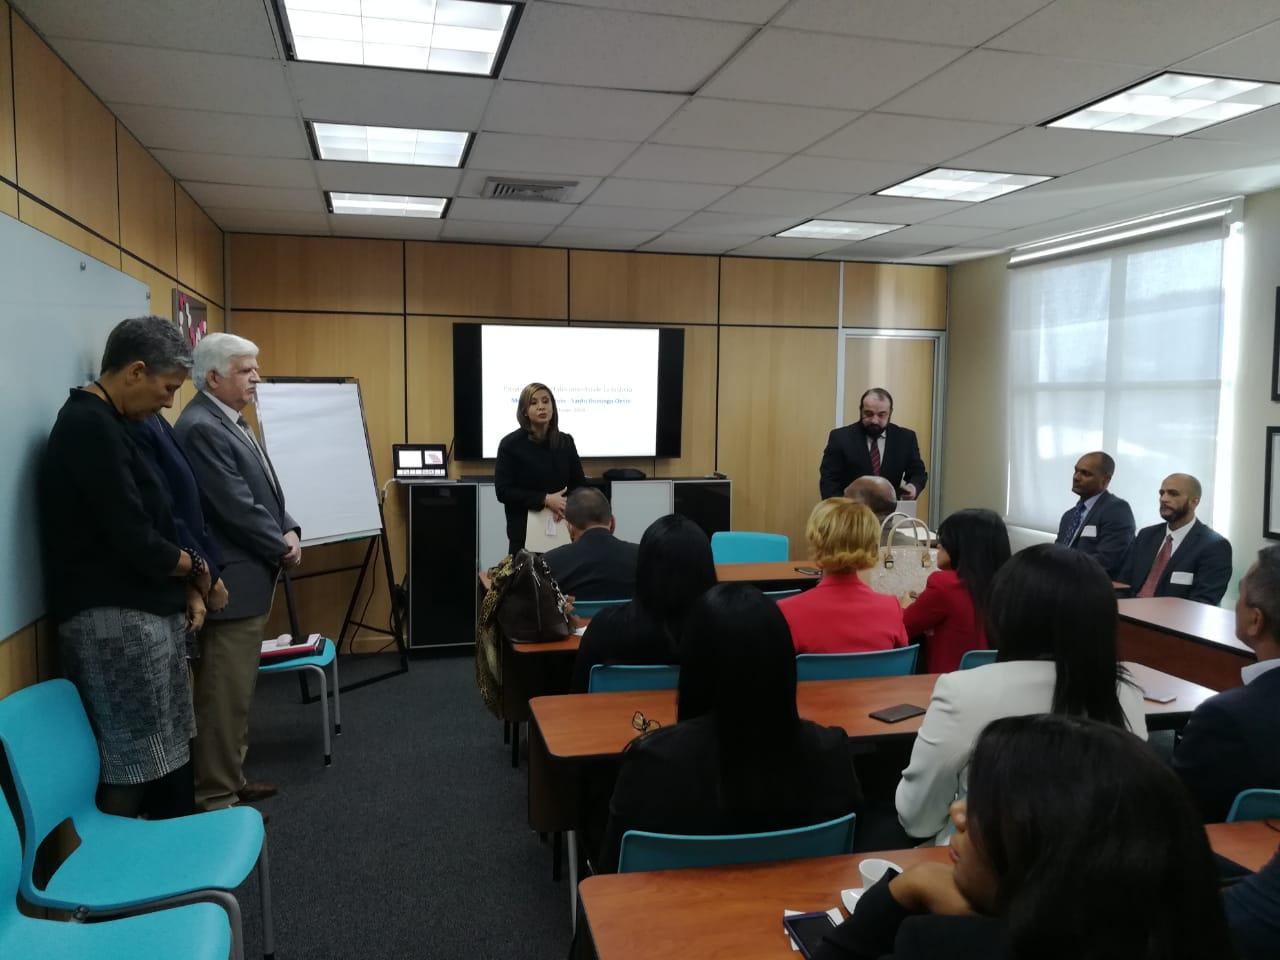 Fiscales de Santo Domingo Oeste reciben capacitación para fortalecer procesos de investigación